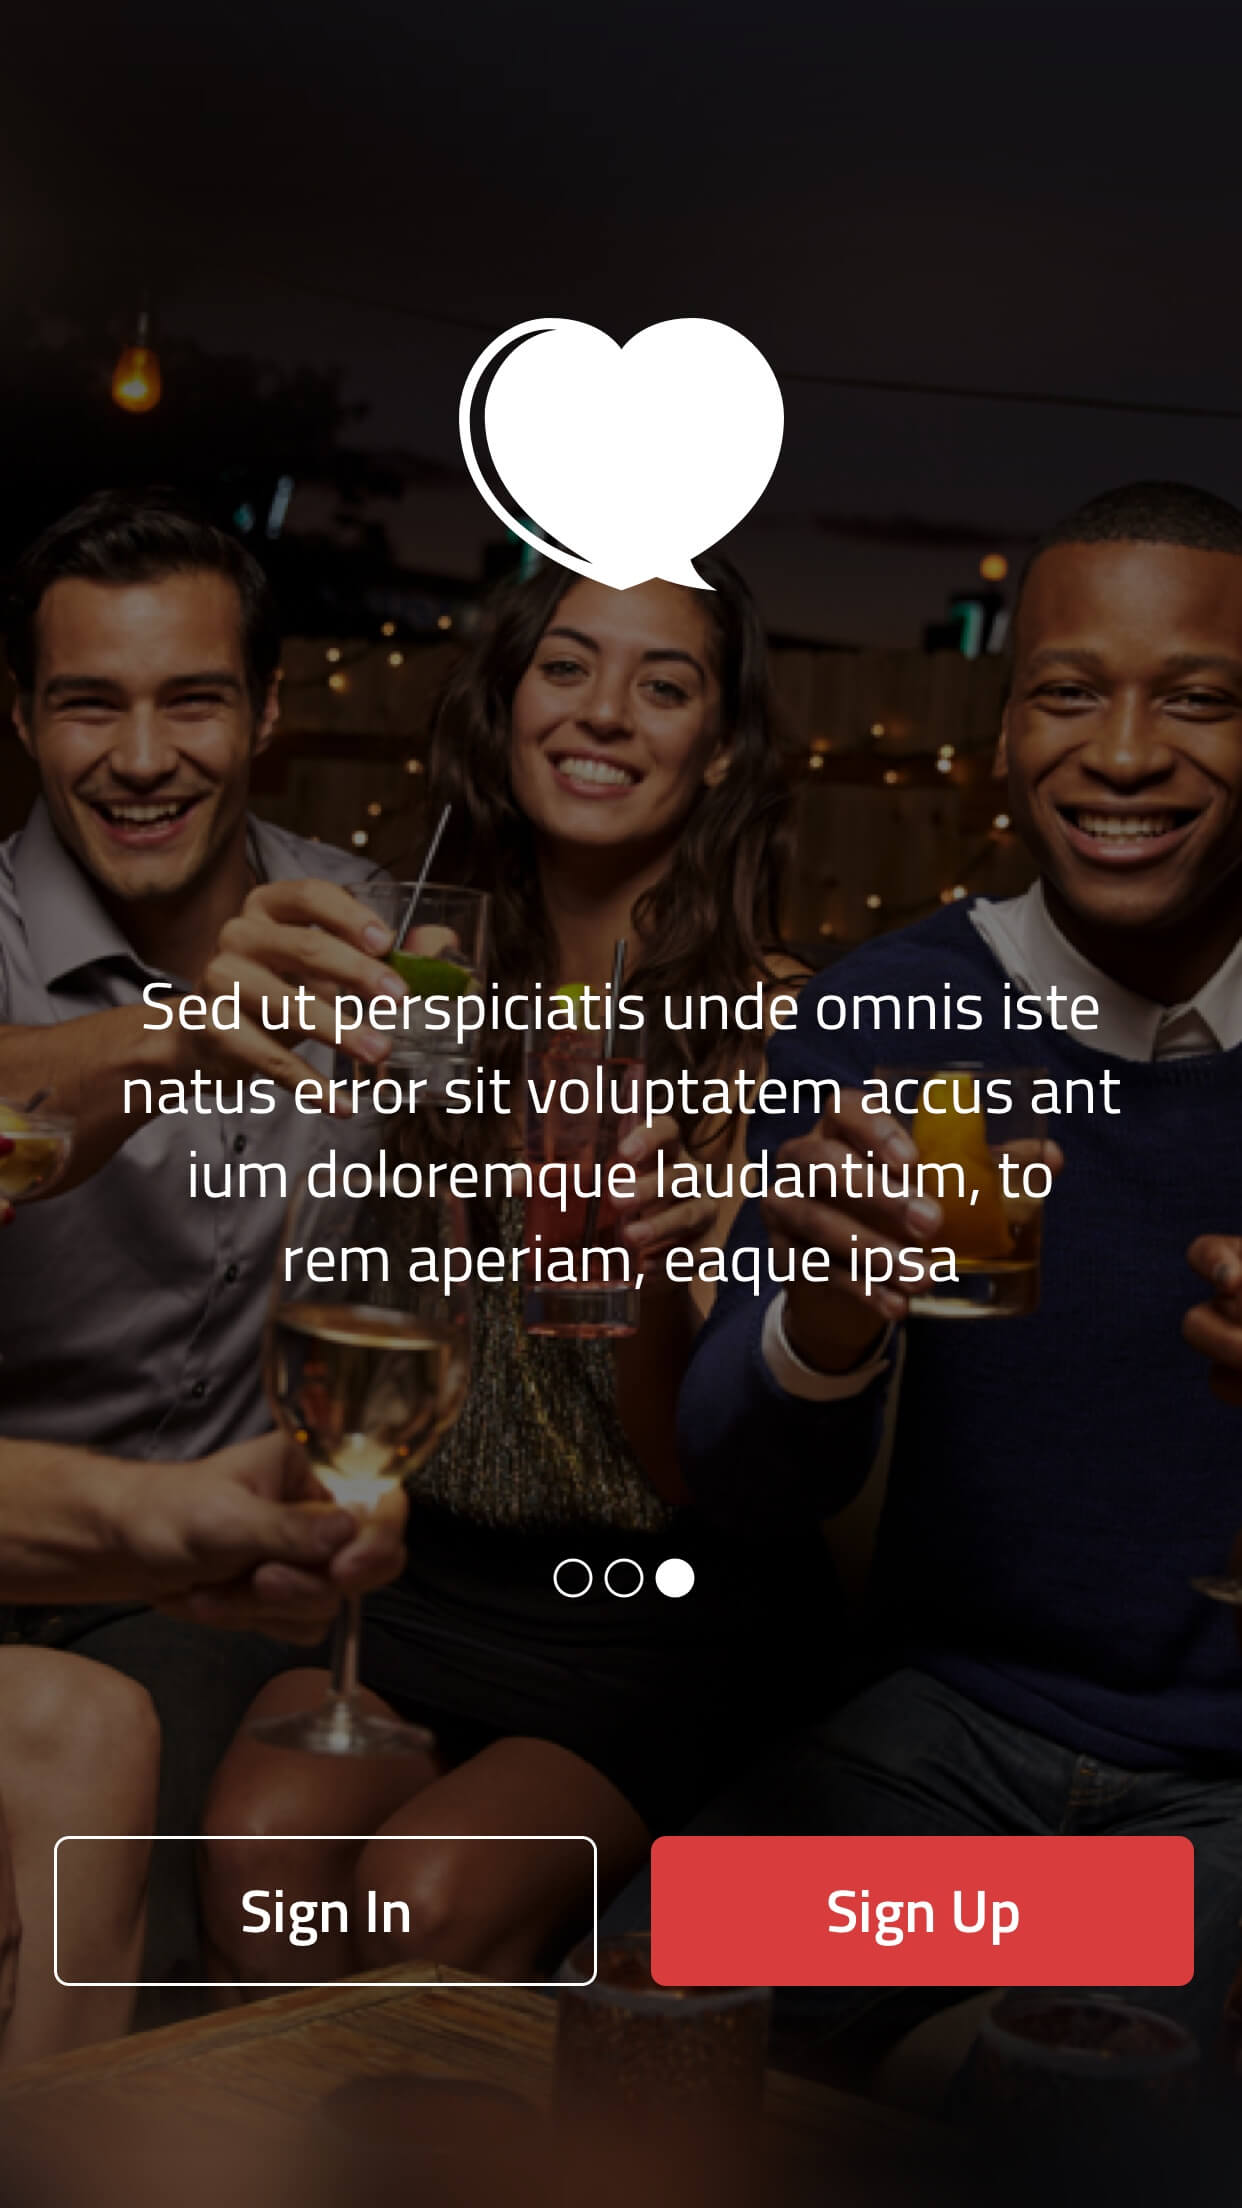 cubix web development